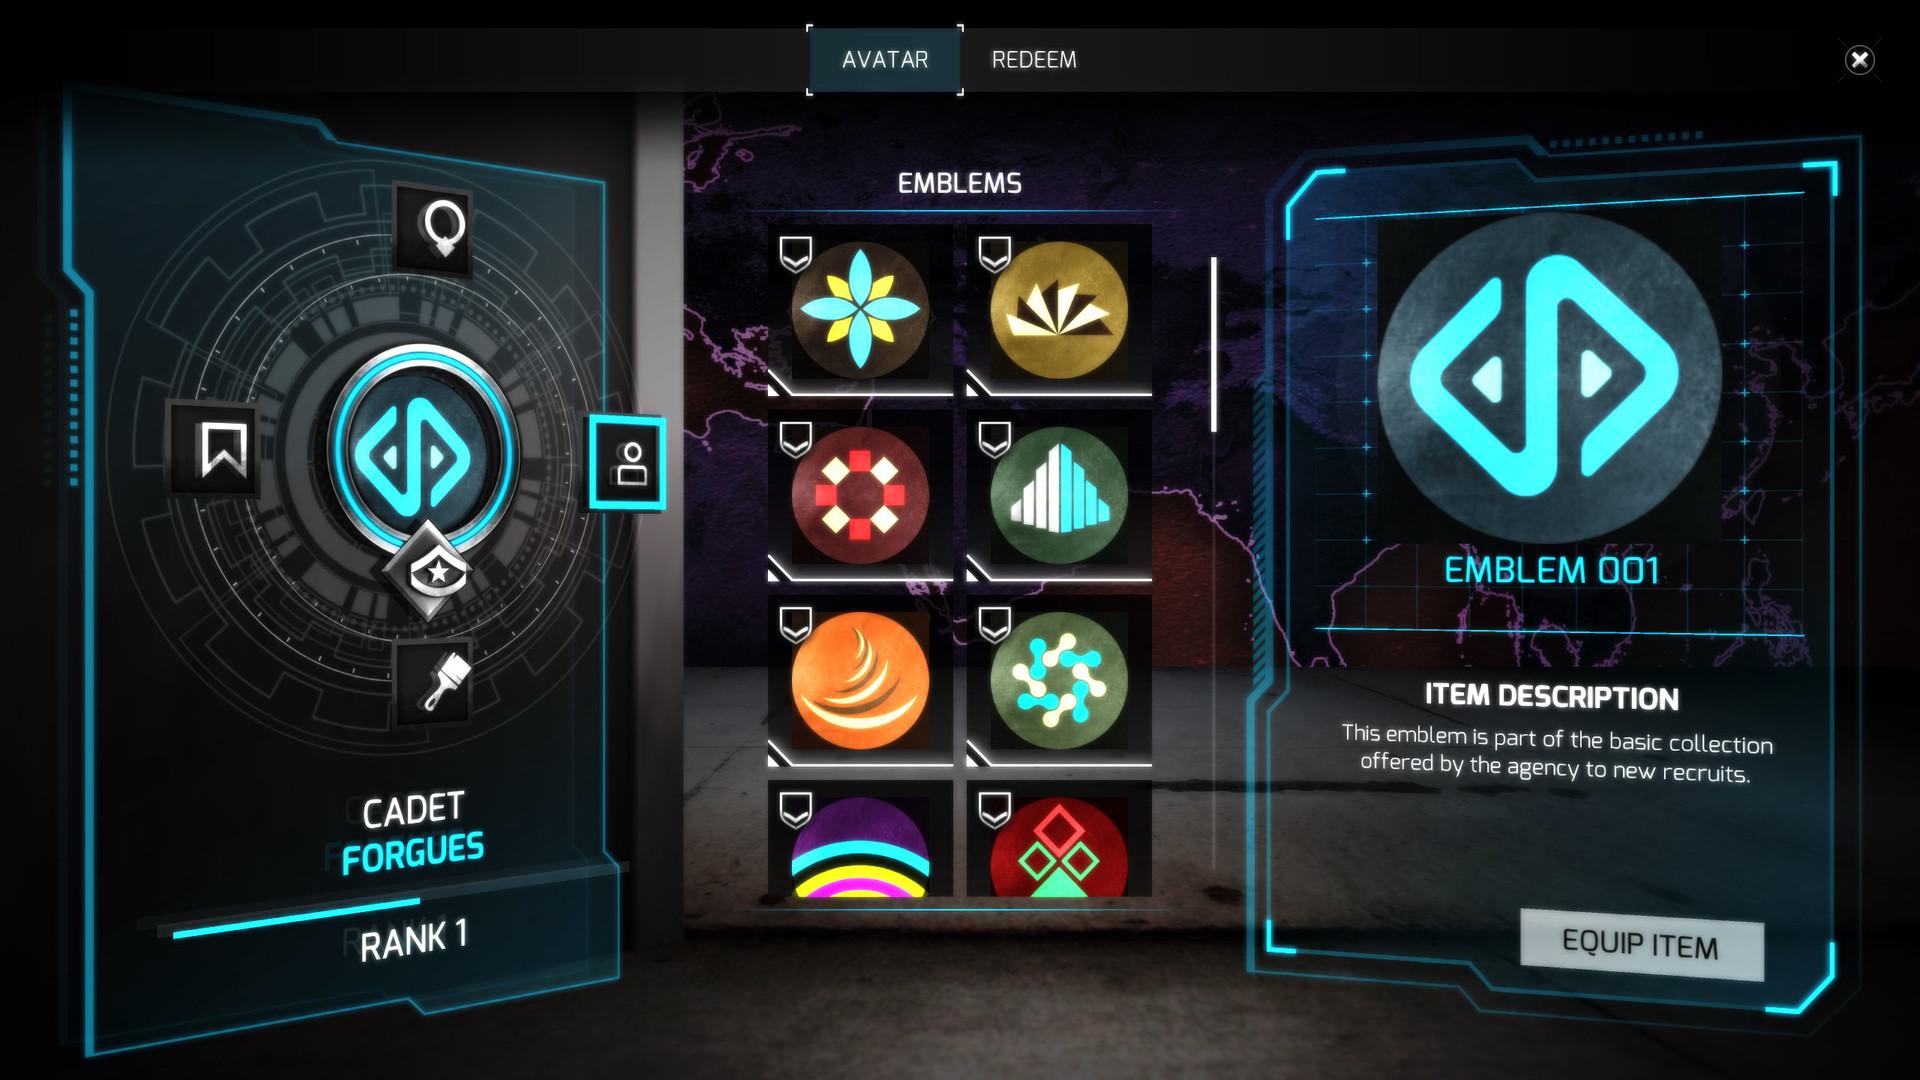 Nite Team 4 Military Hacking Division Bei Steam